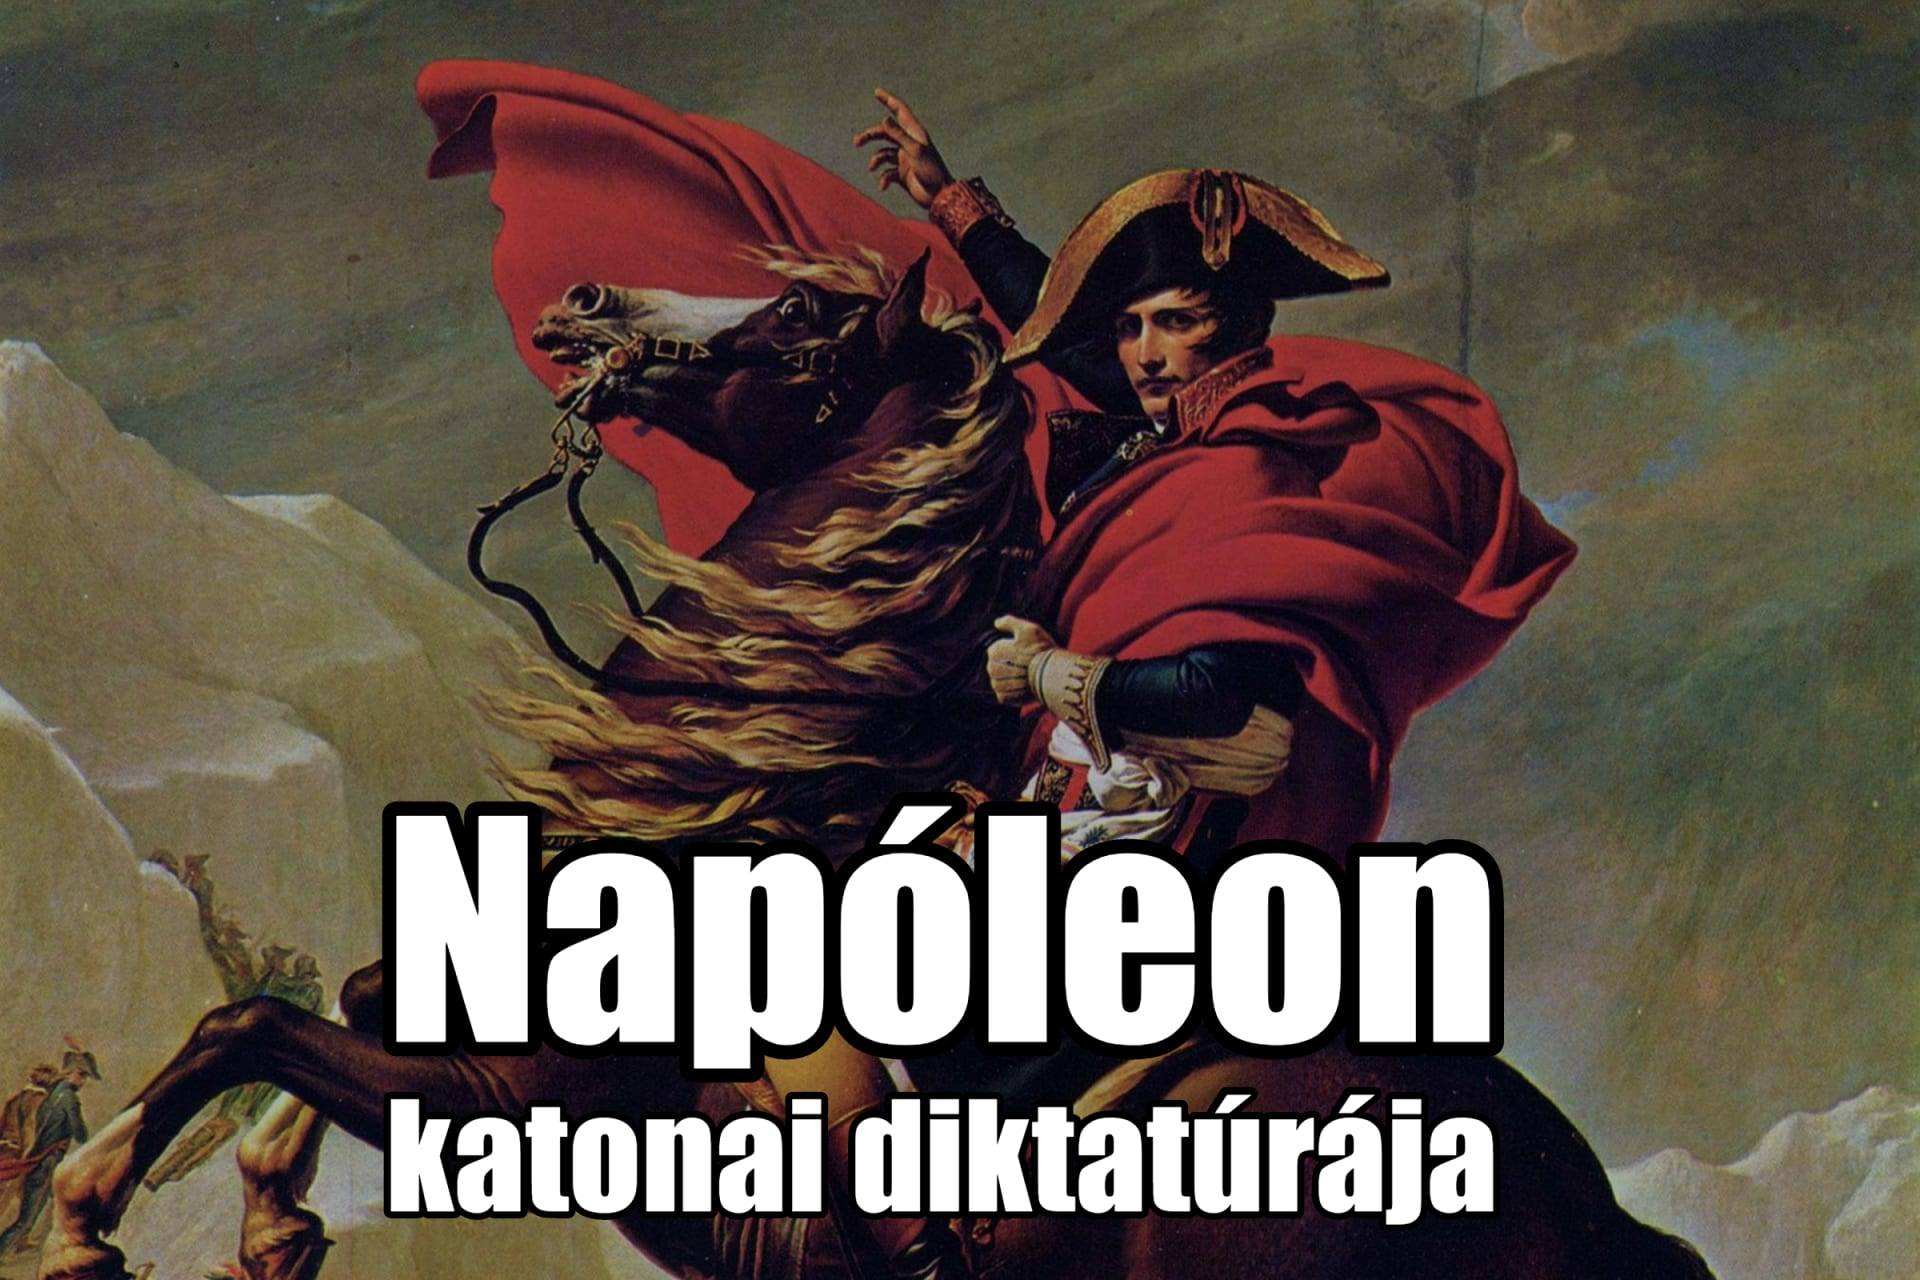 Napóleon katonai diktatúrája